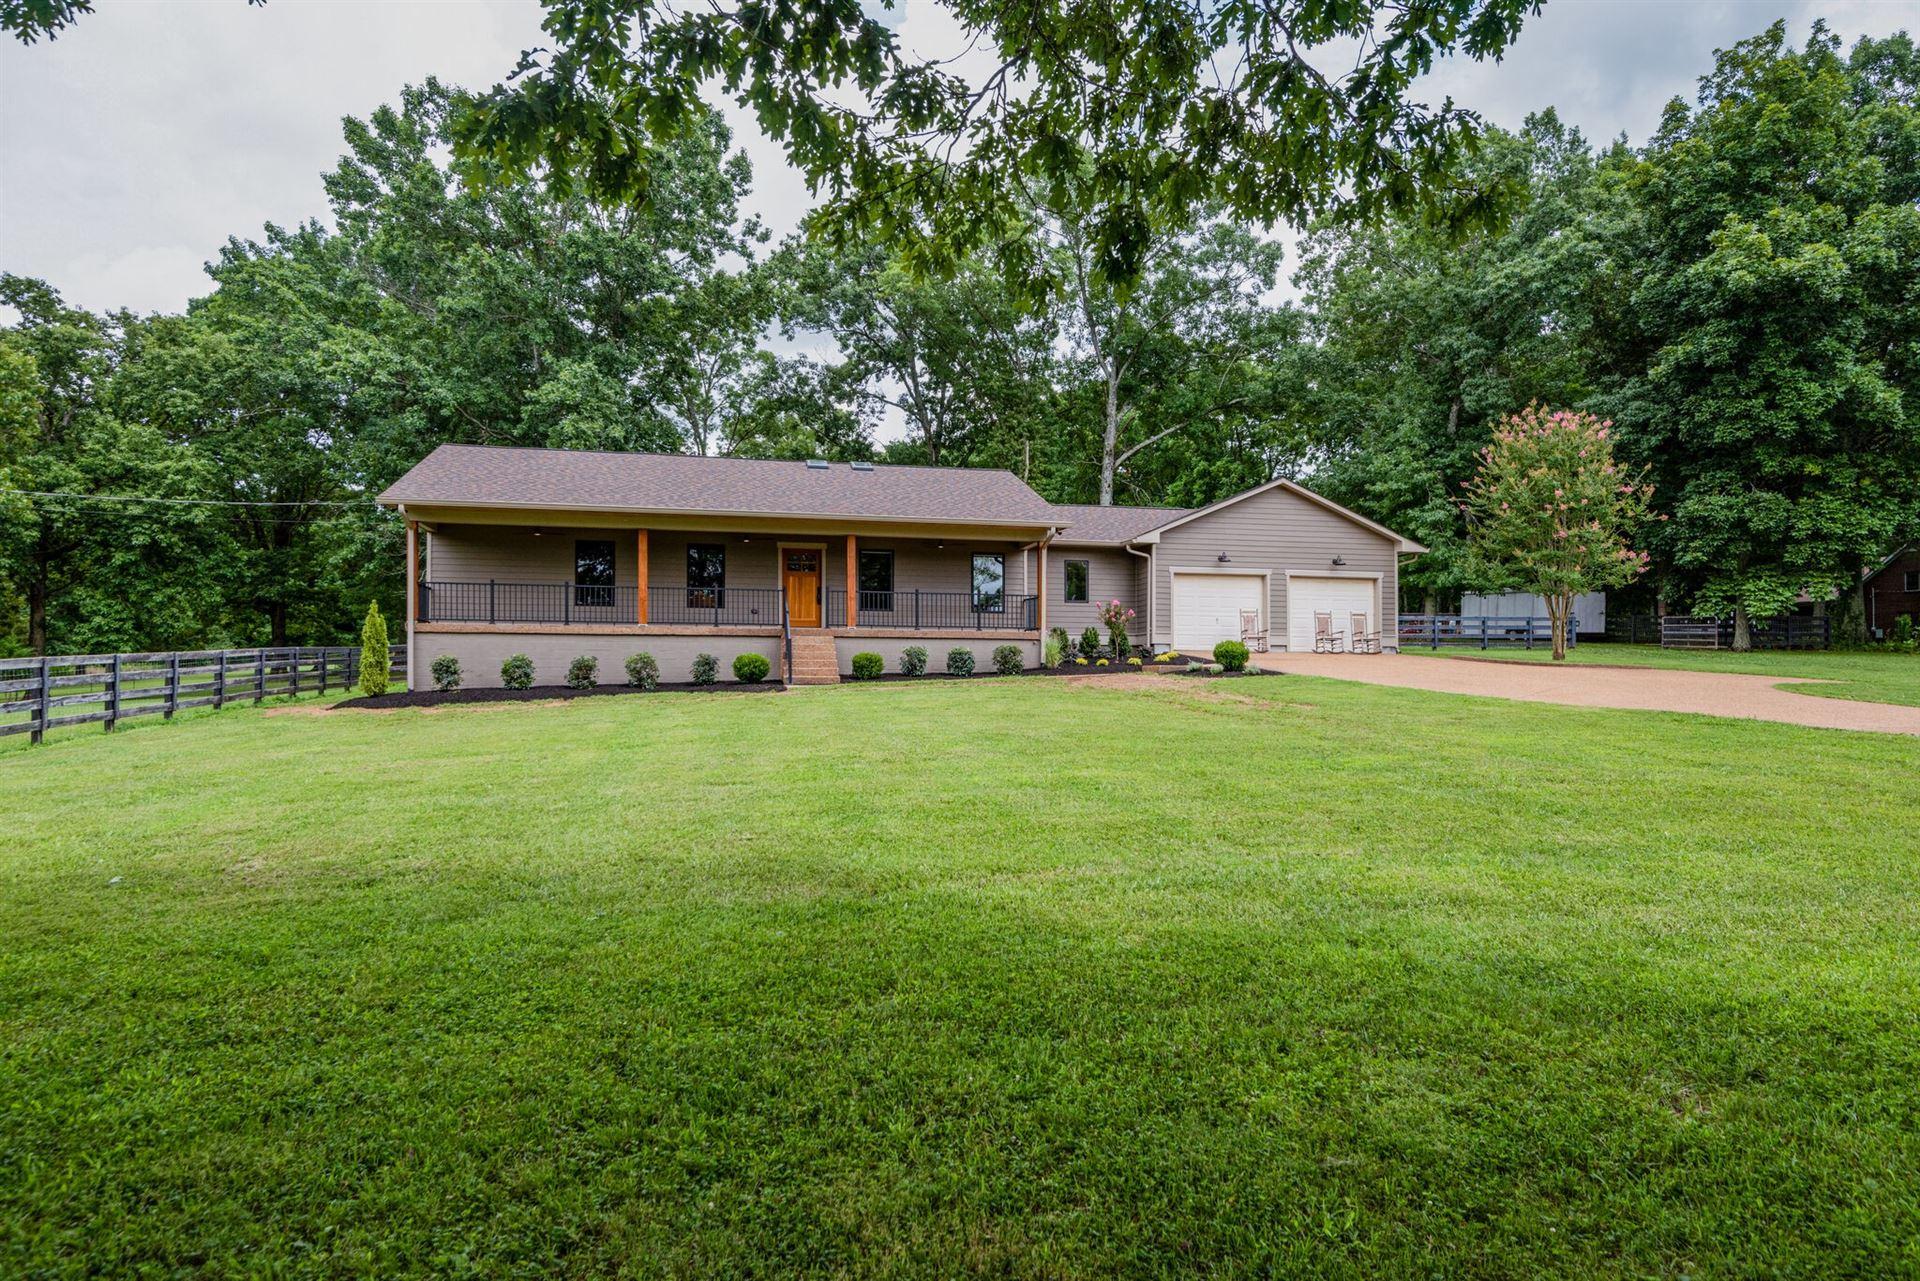 Photo of 9813 Split Log Rd, Brentwood, TN 37027 (MLS # 2274674)